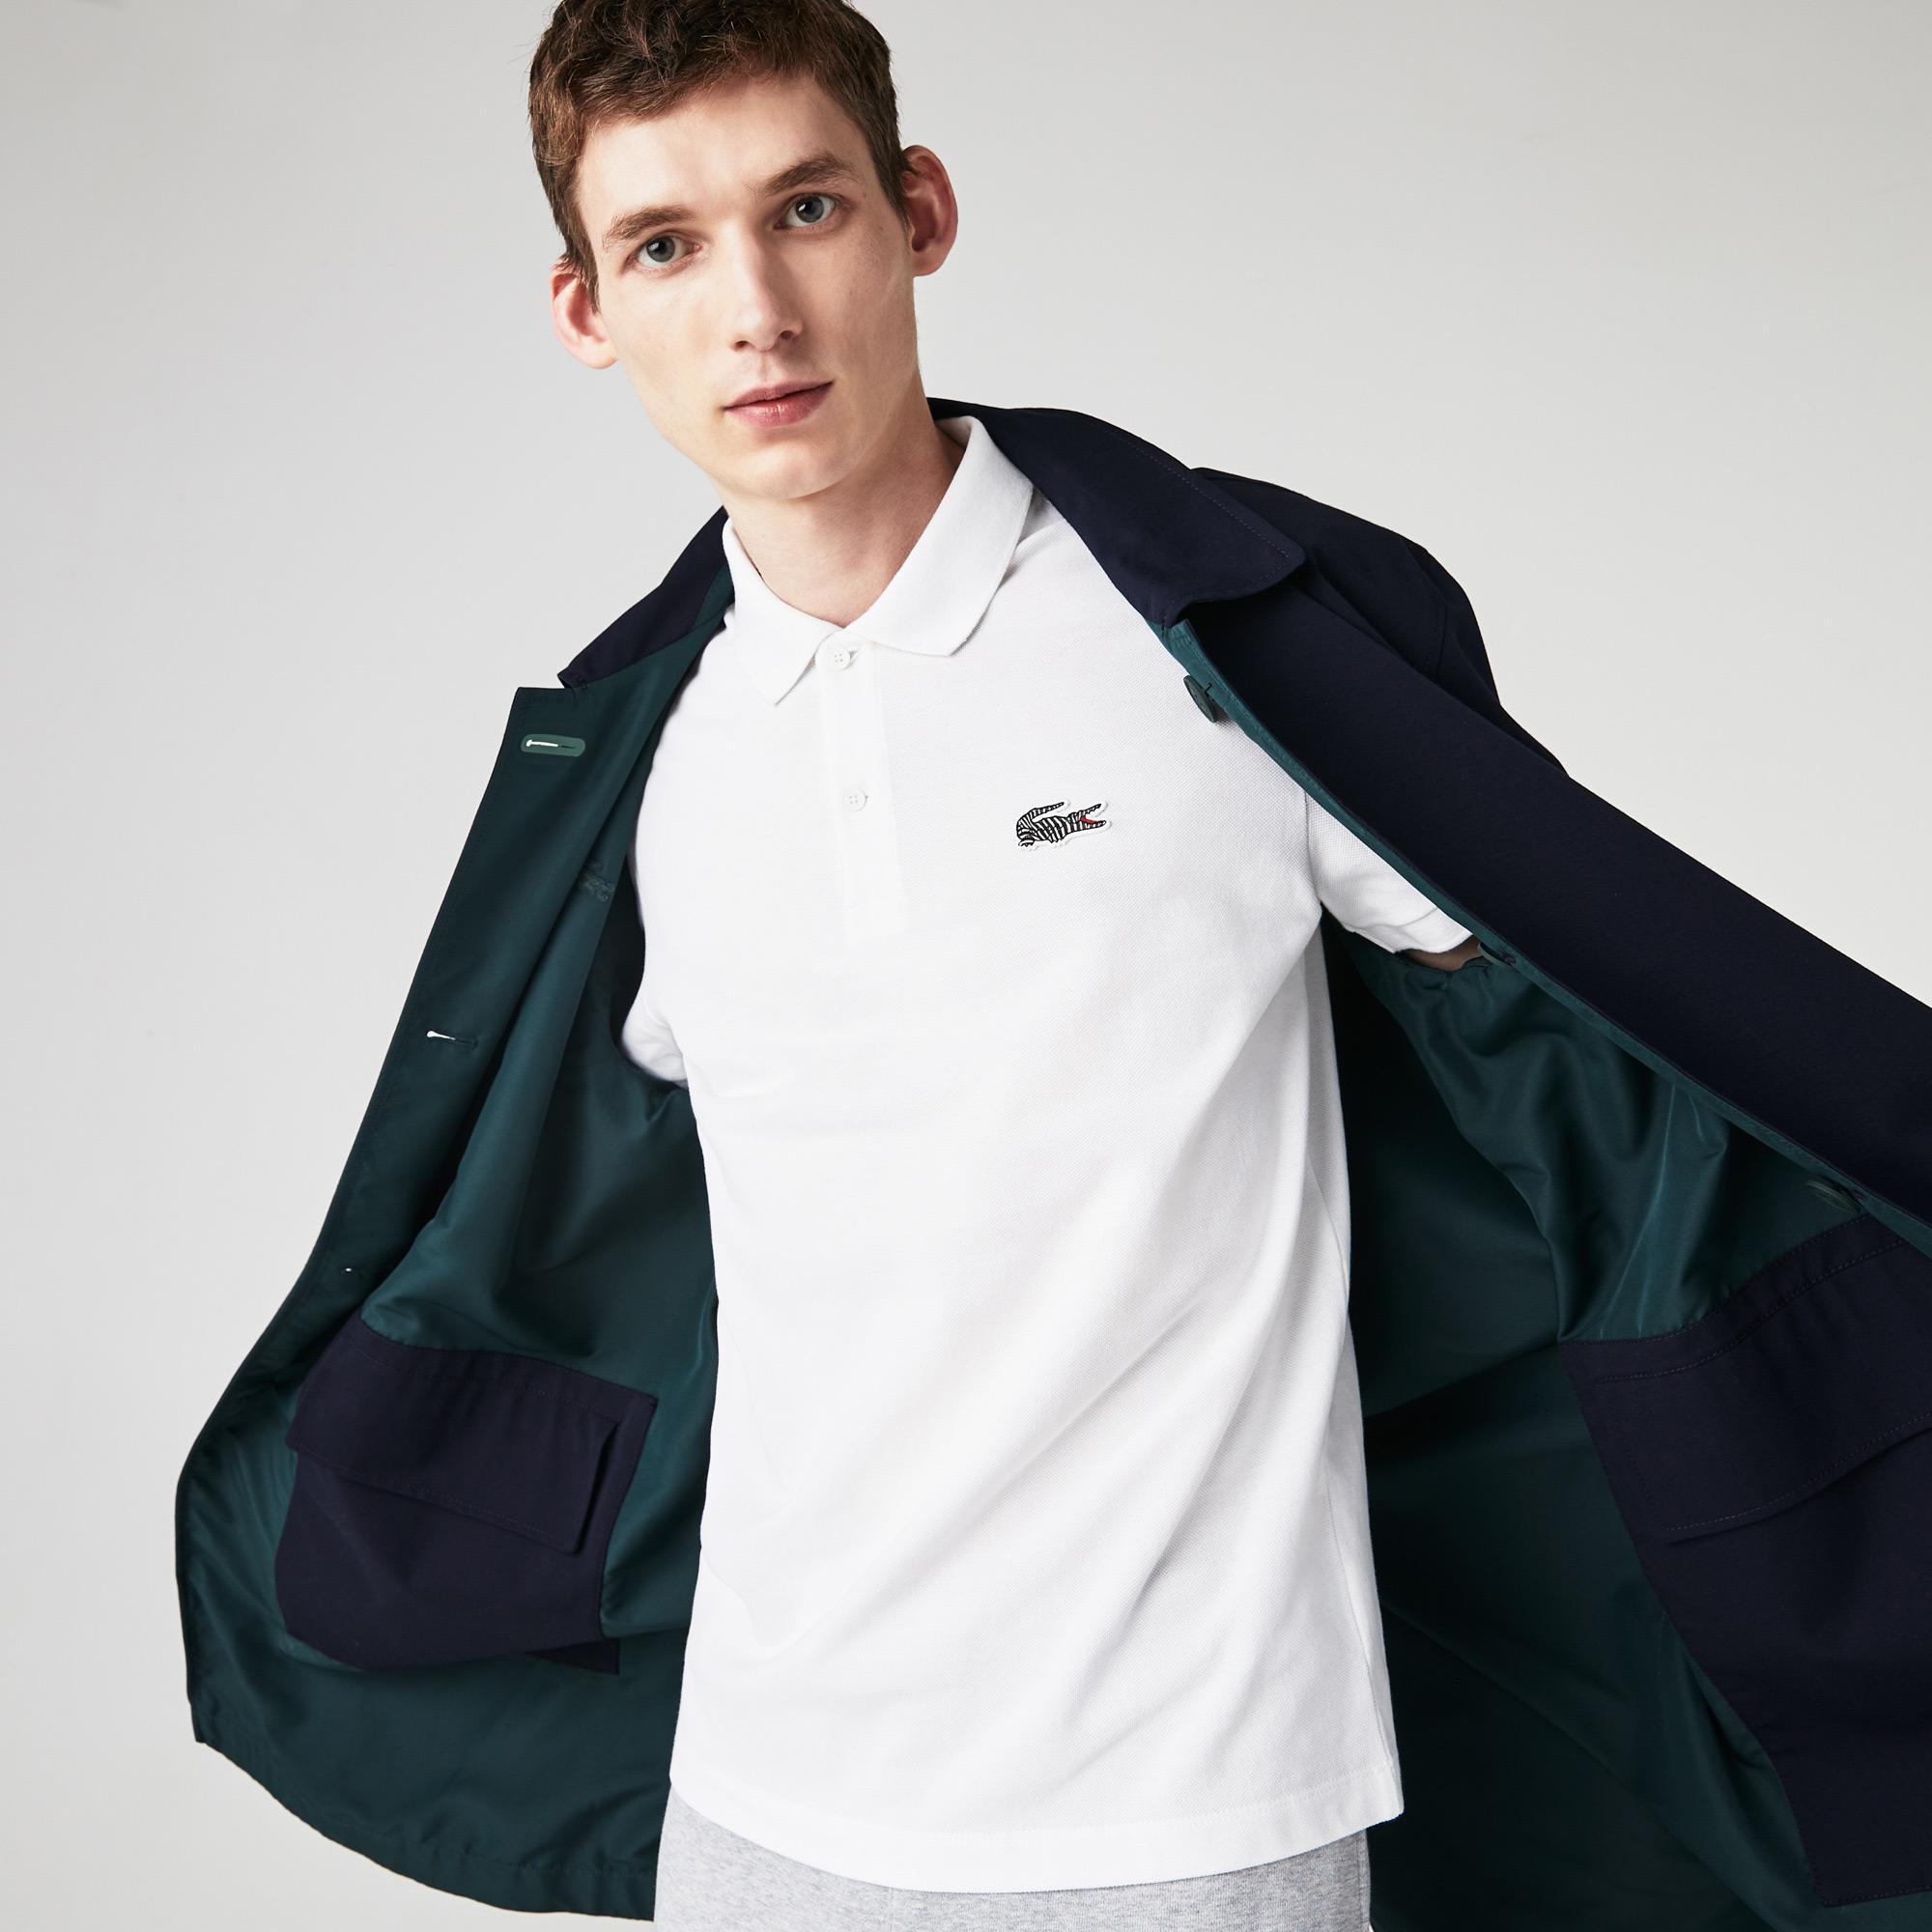 Lacoste Men's x National Geographic Organic Cotton Piqué Polo